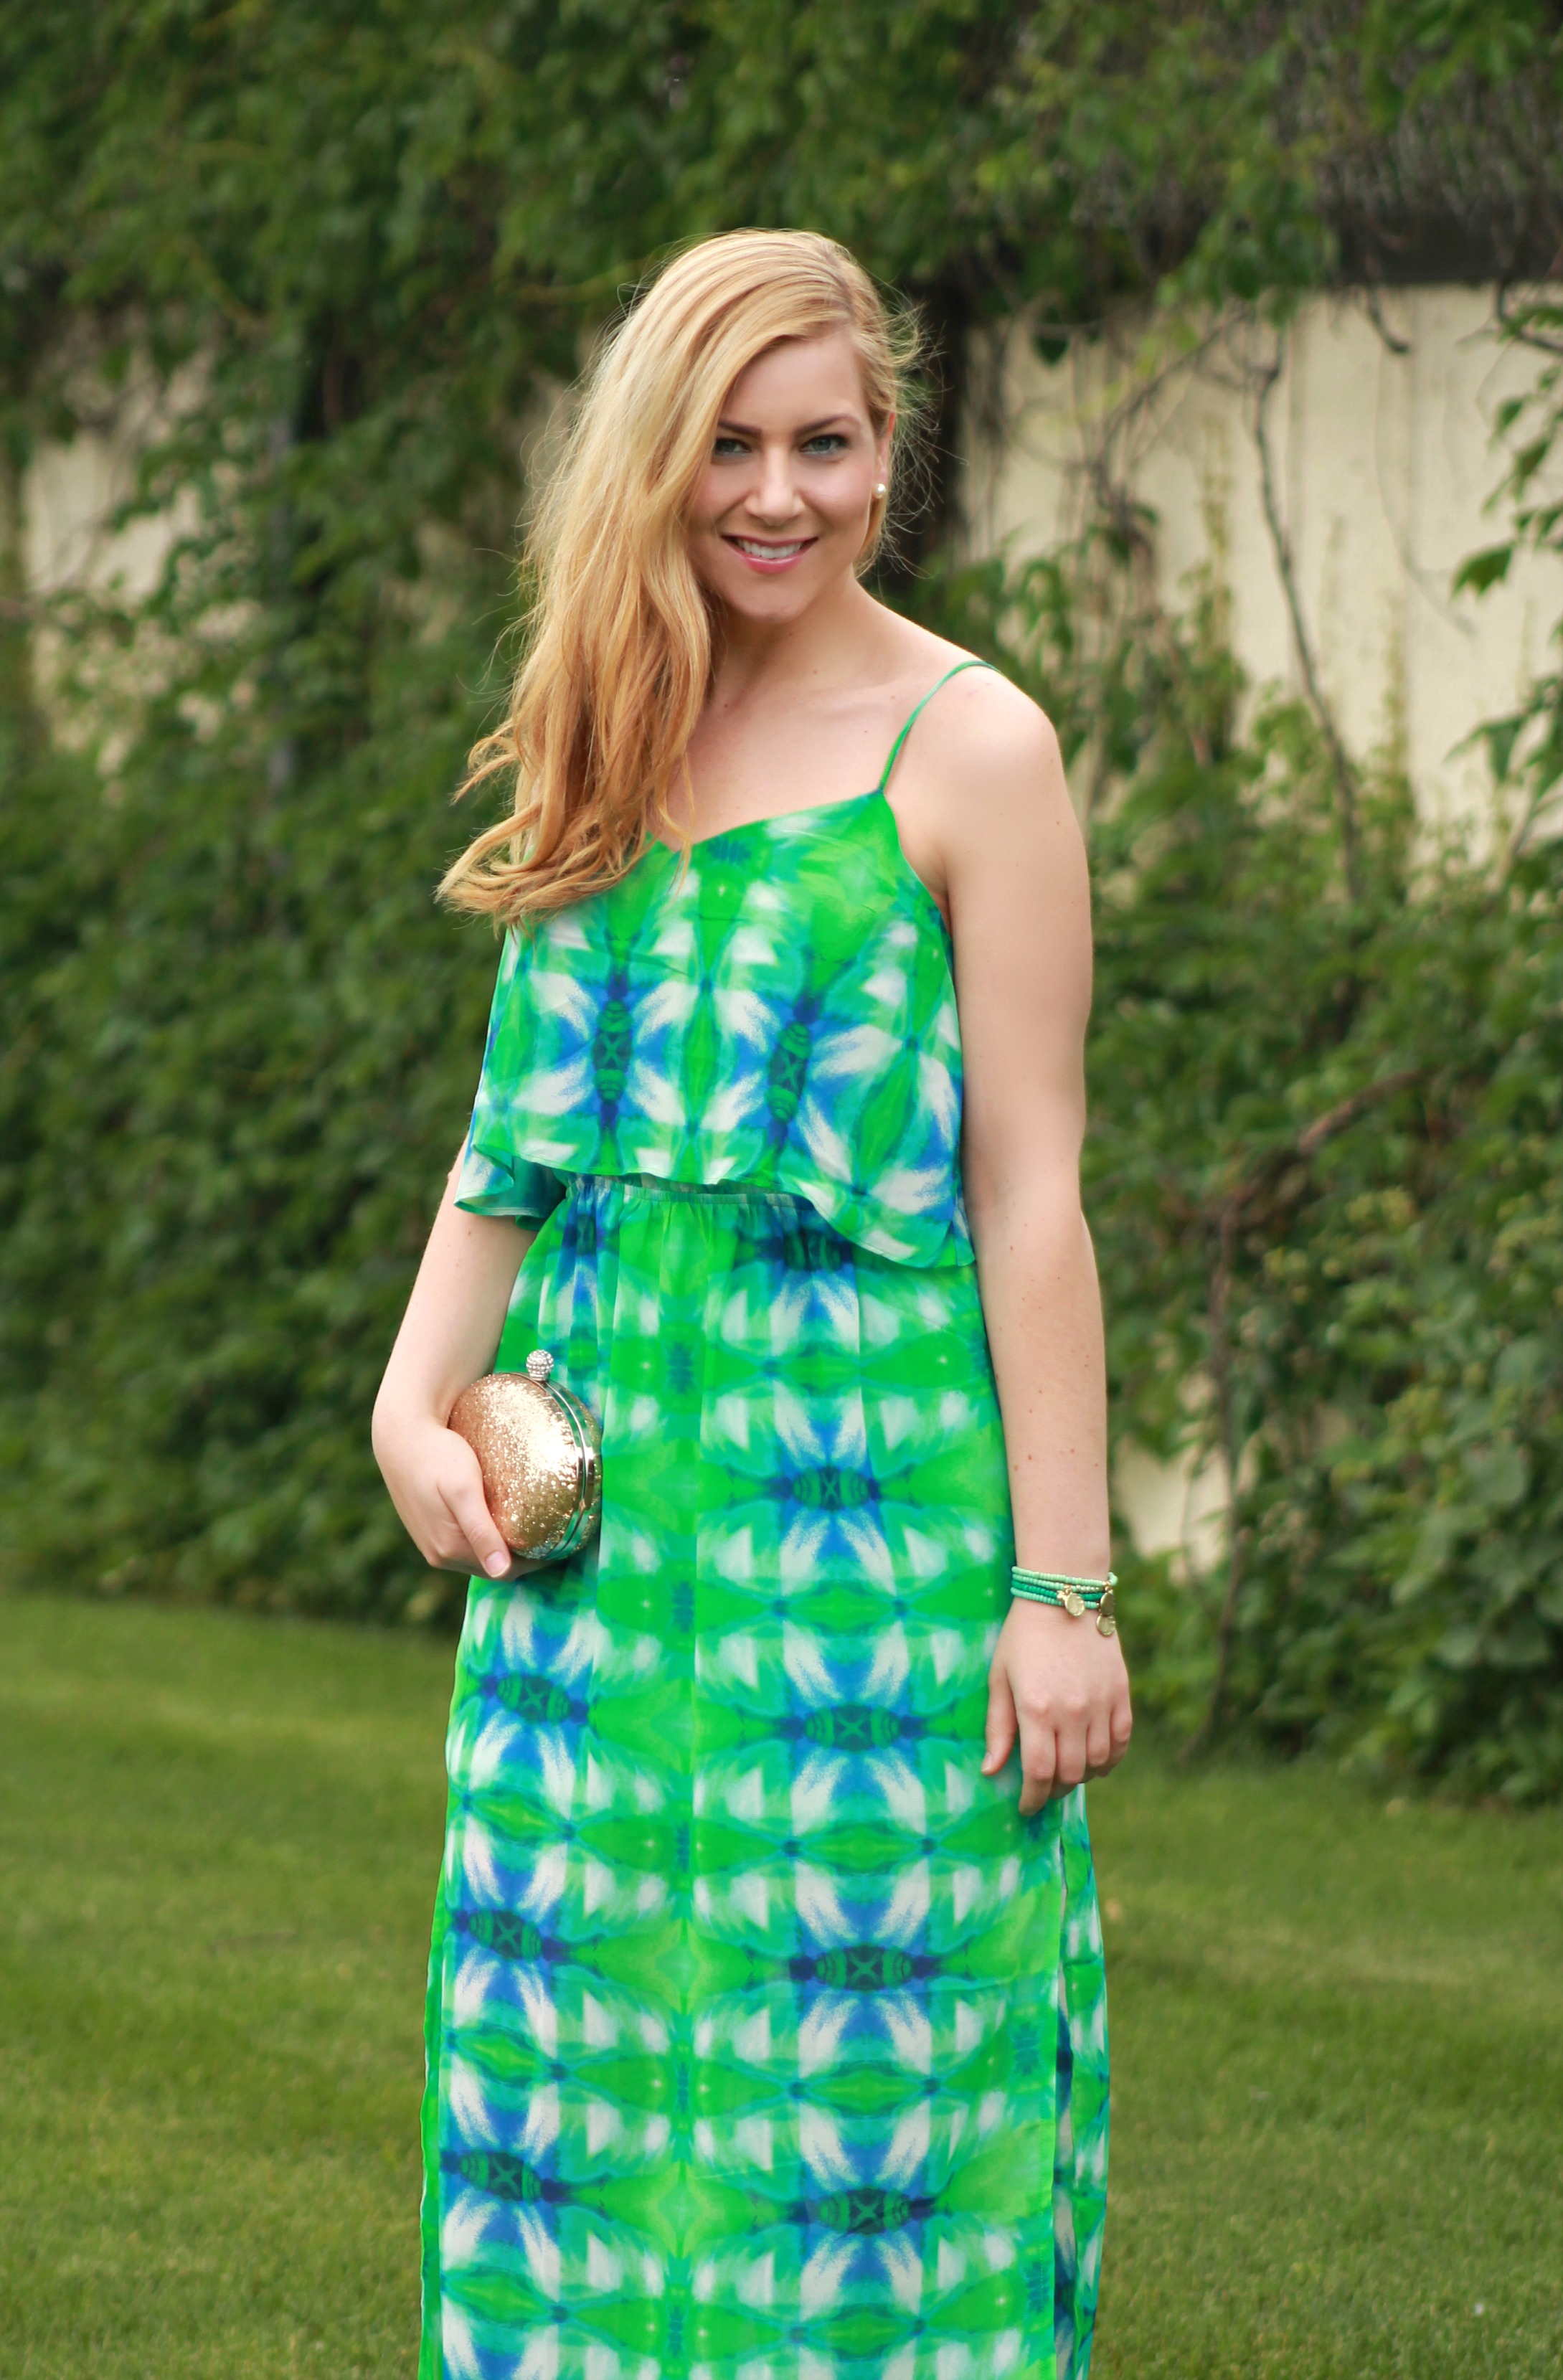 summer maxi dress for date night